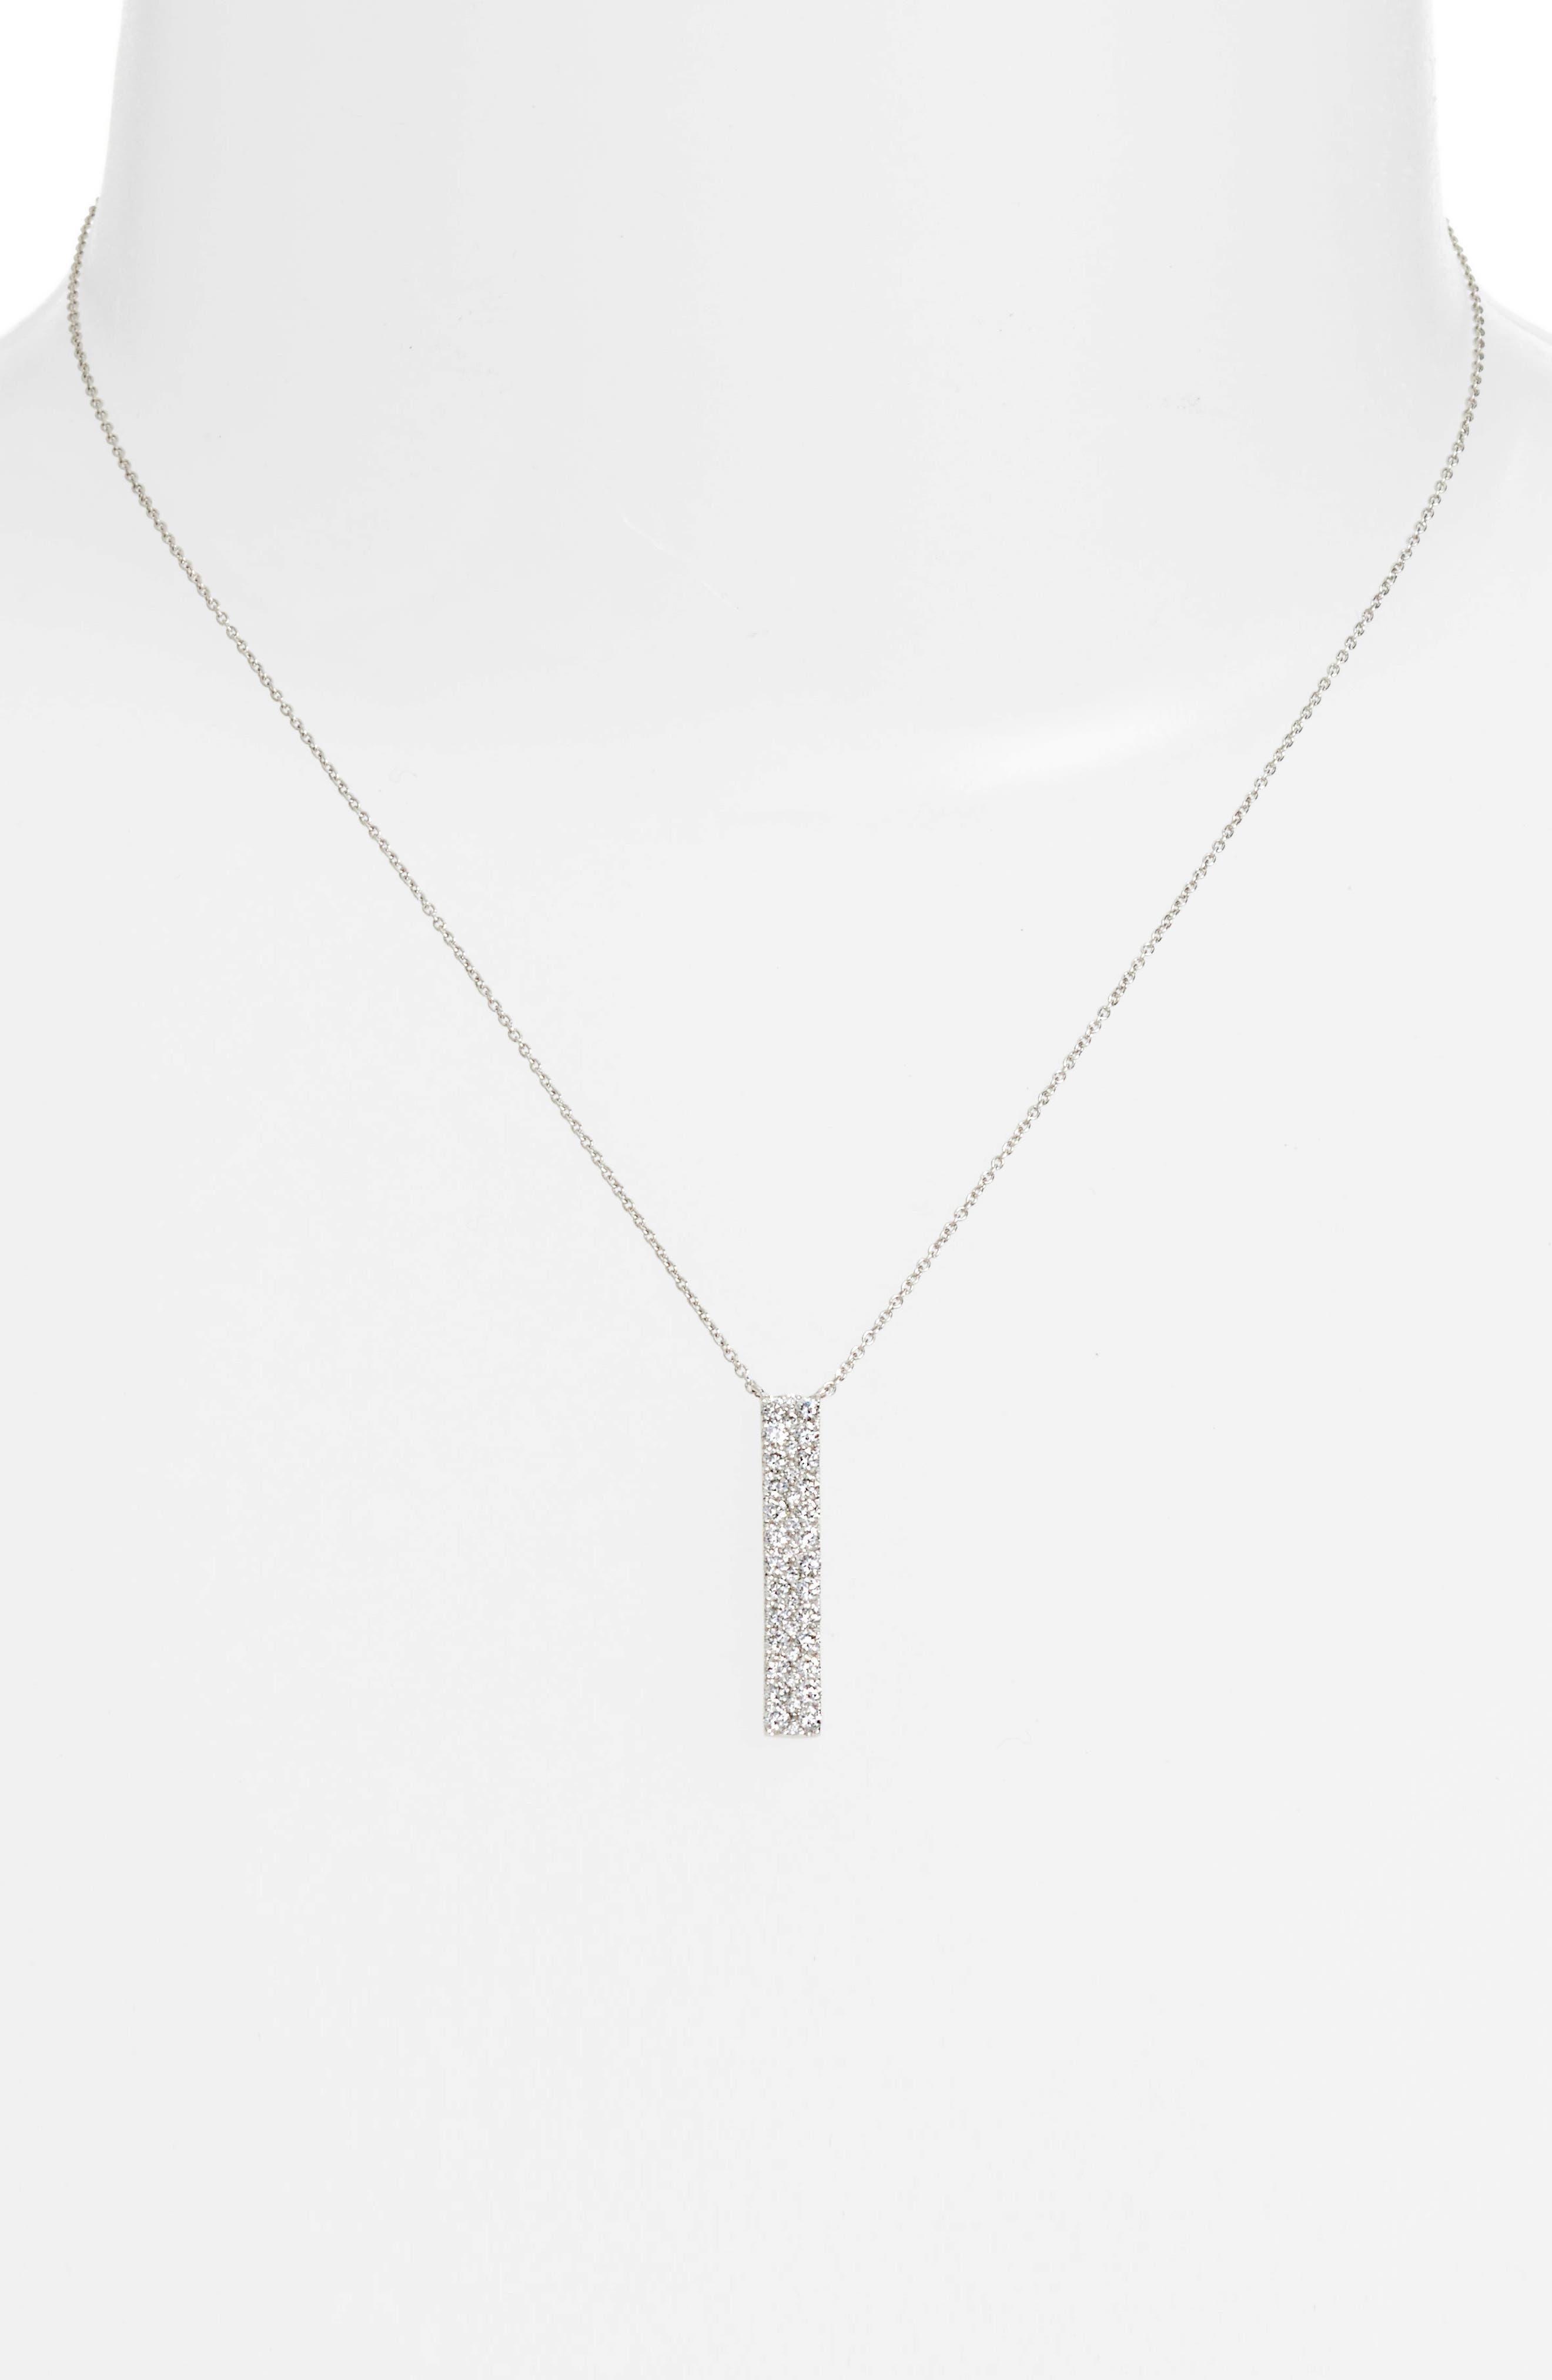 Kiera Diamond Bar Pendant Necklace,                             Main thumbnail 1, color,                             711